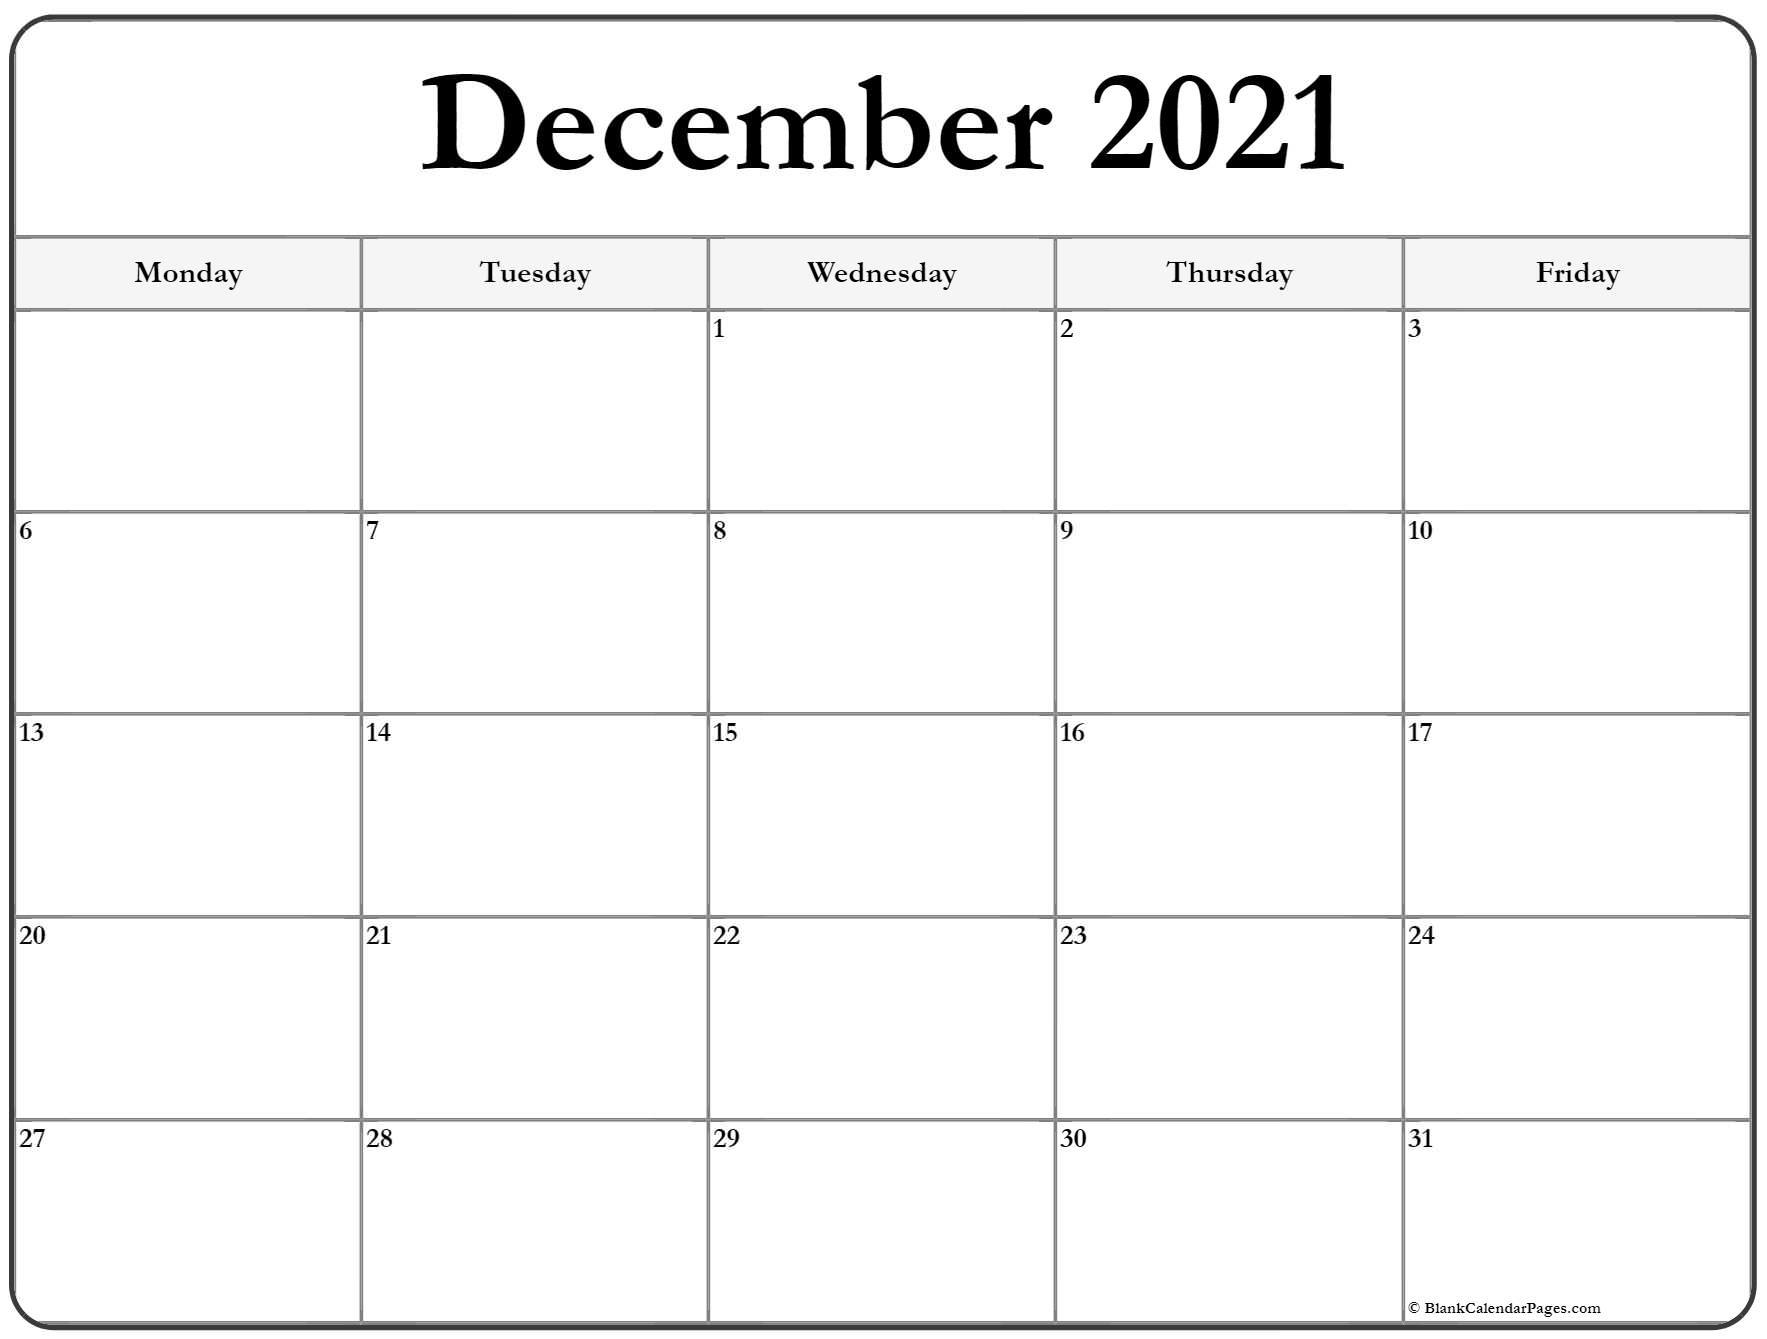 December 2021 Monday Calendar   Monday To Sunday